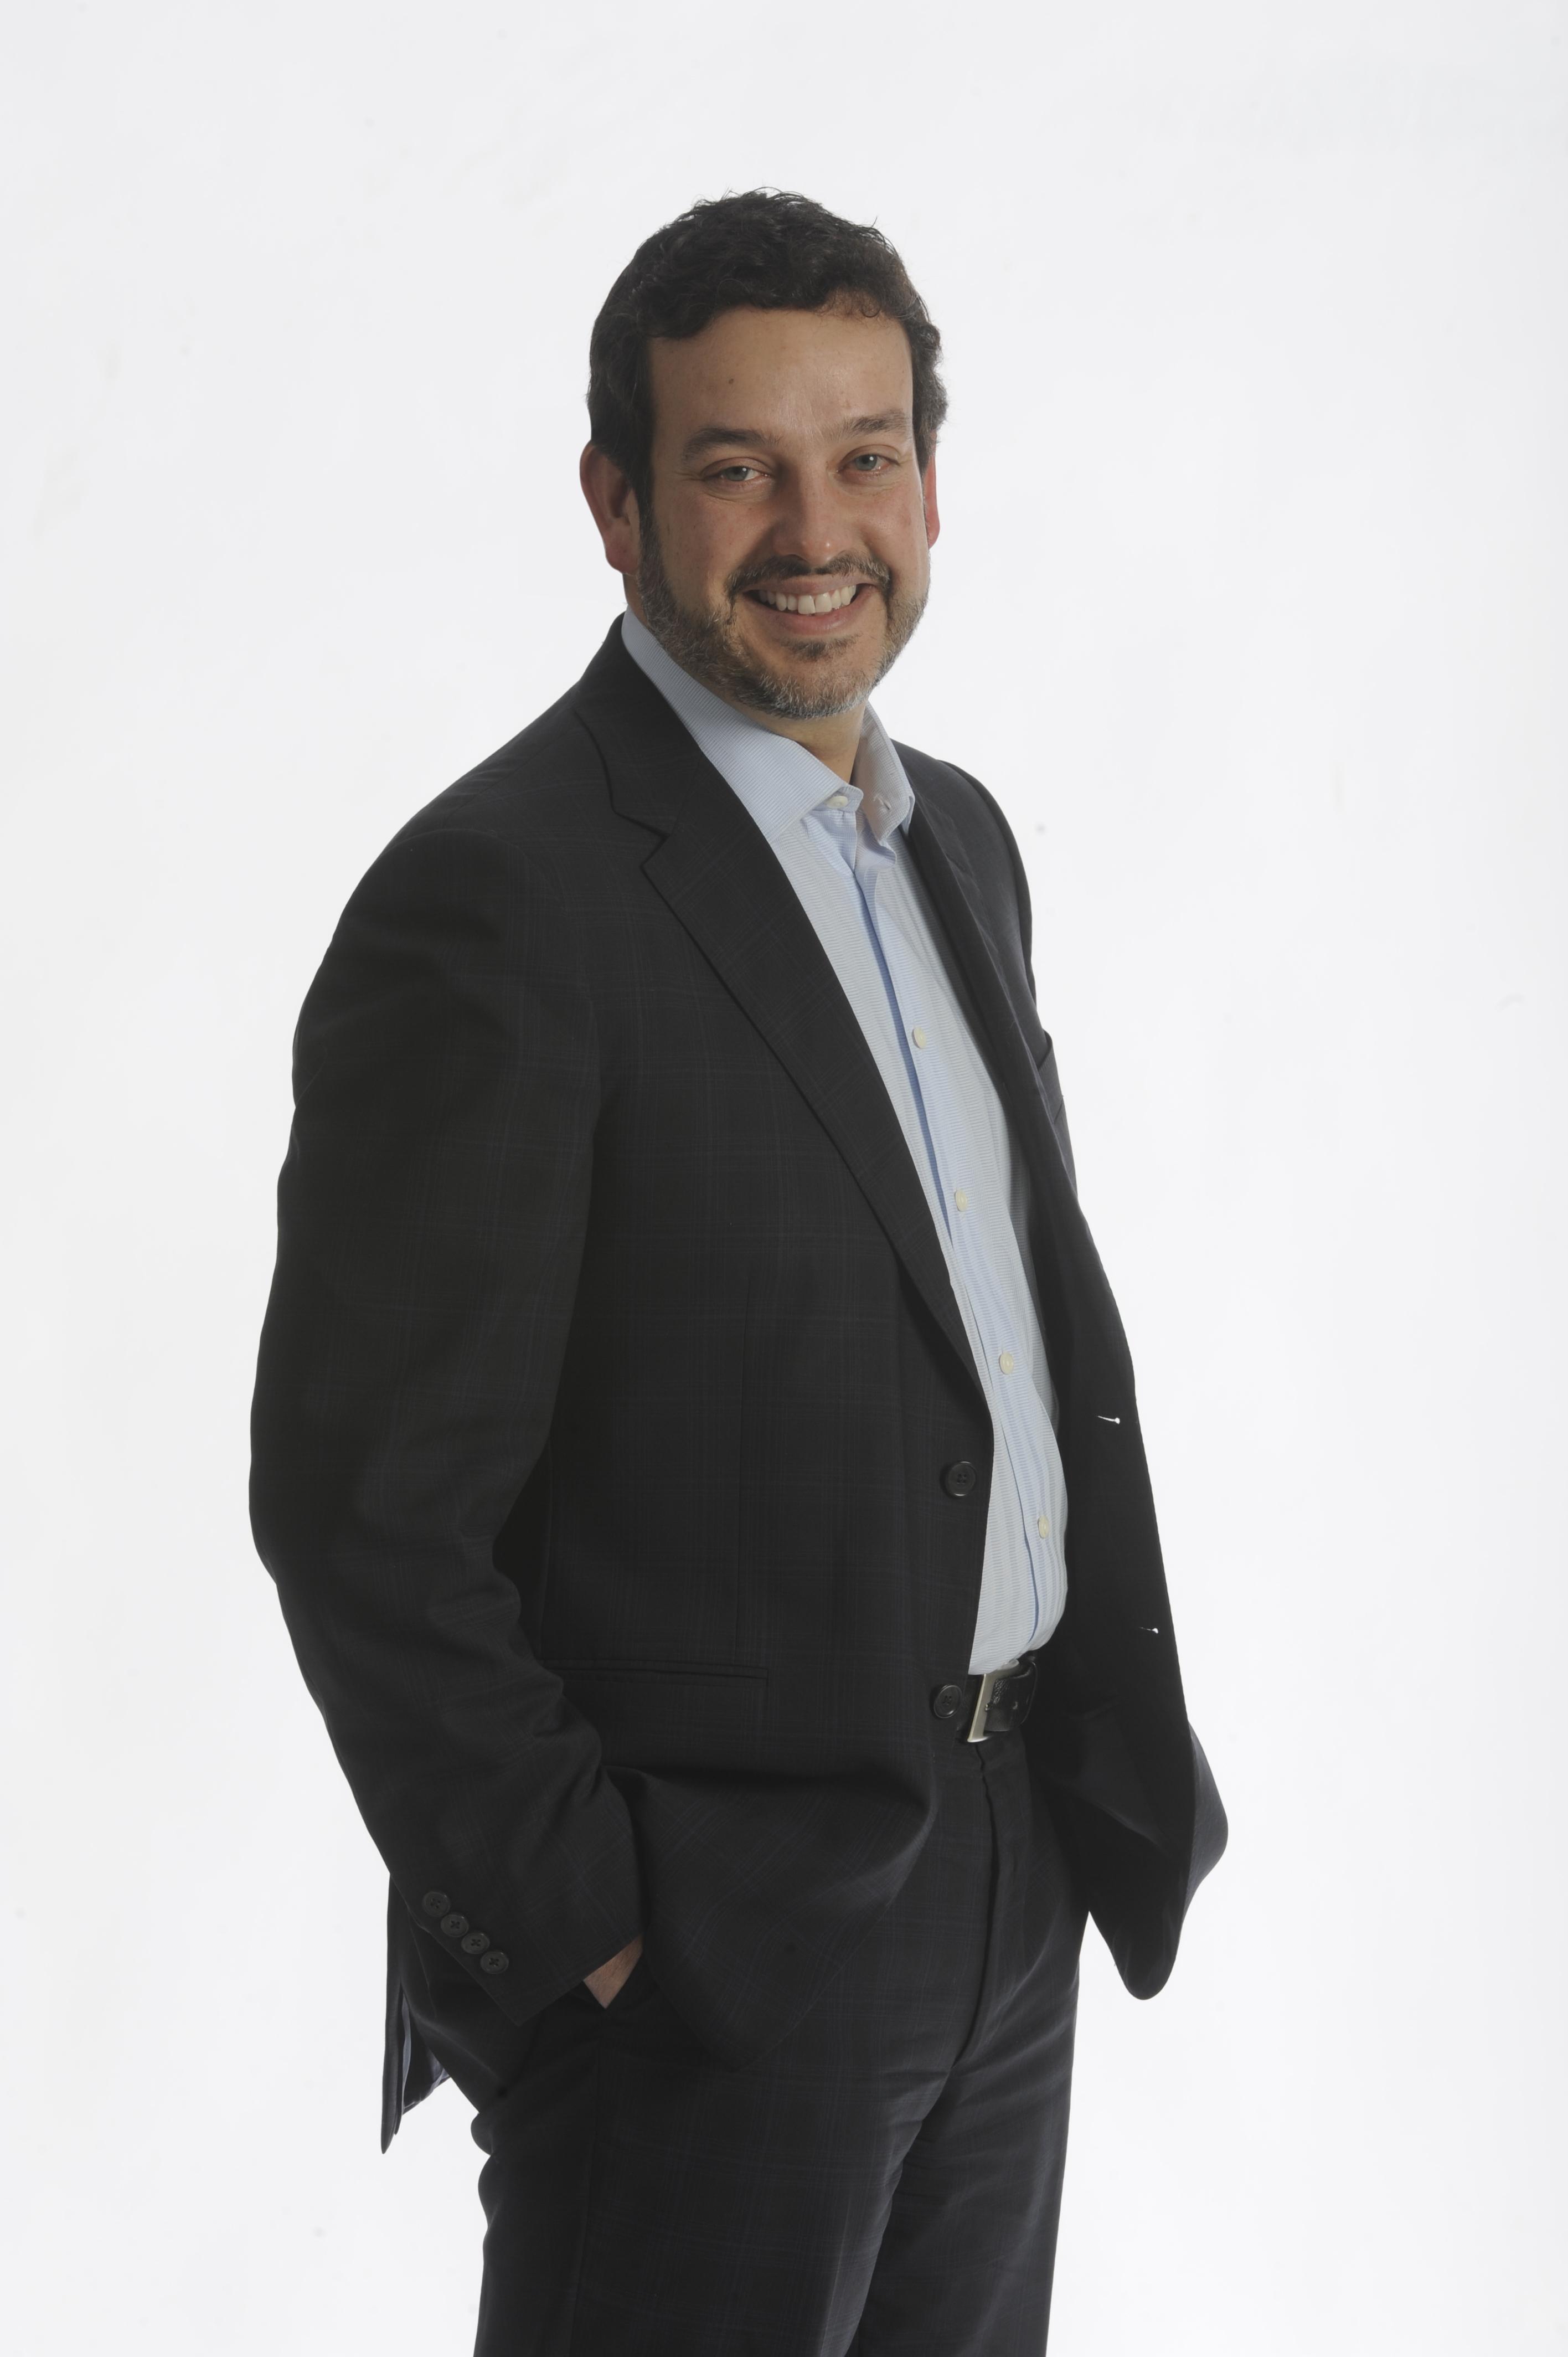 Gil McGowan, AFL President